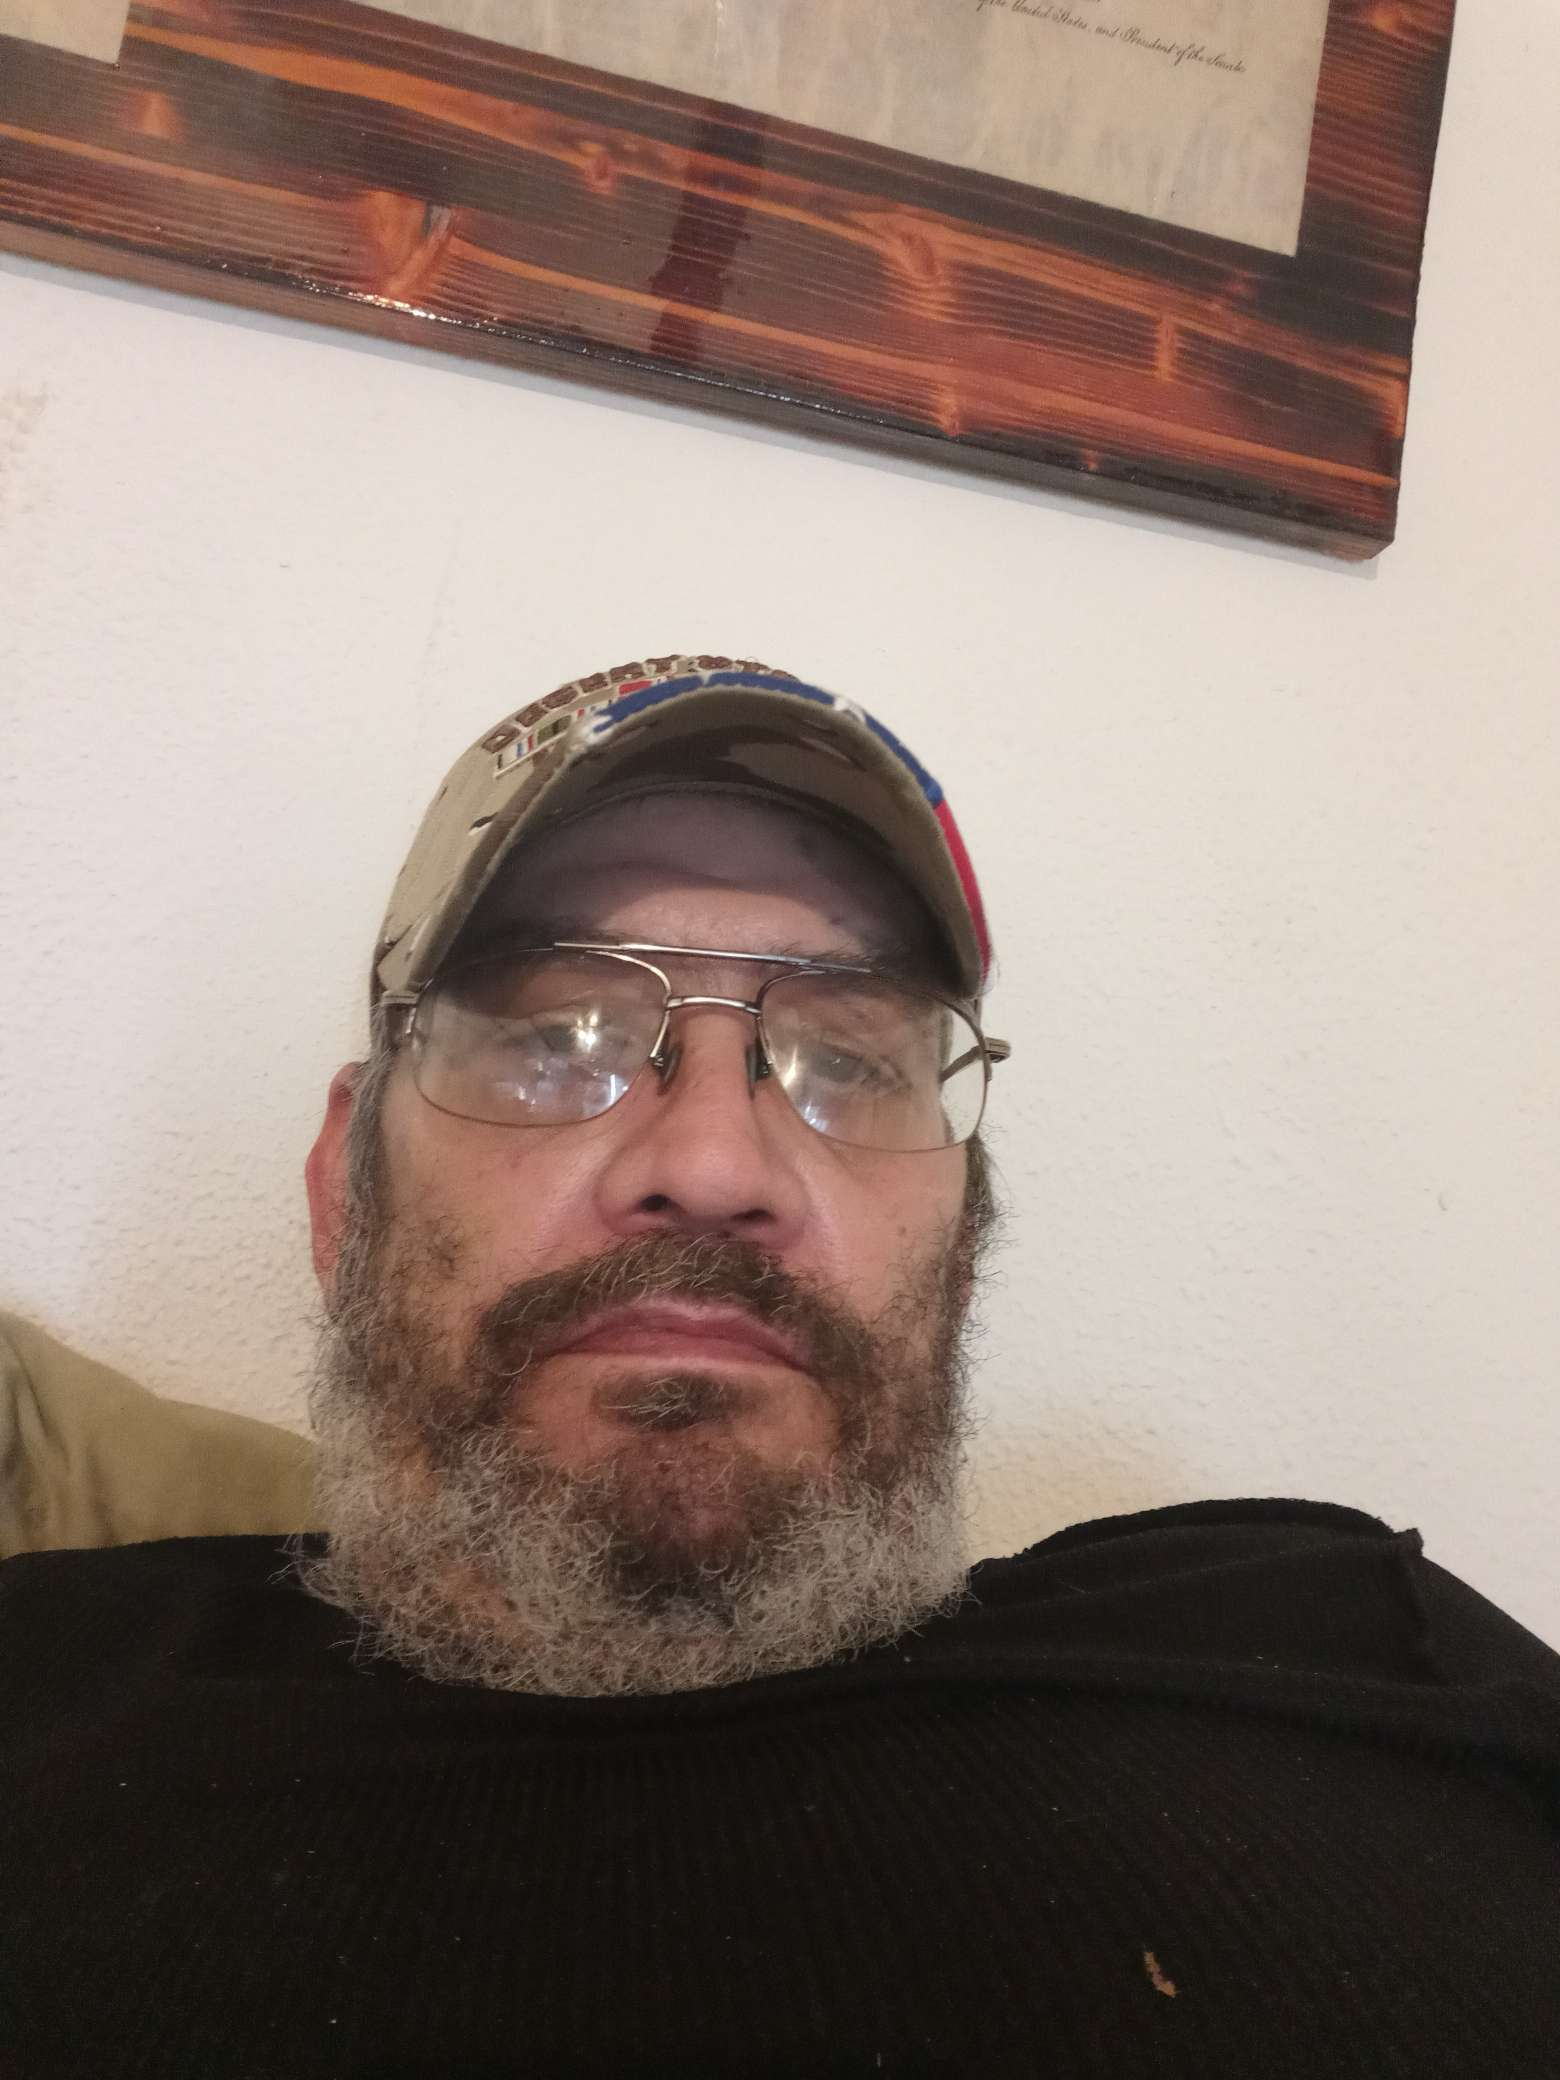 http://catch-app.oss-us-east-1.aliyuncs.com/image/cb692b65a01c633c9cb91cde757baf91.jpeg